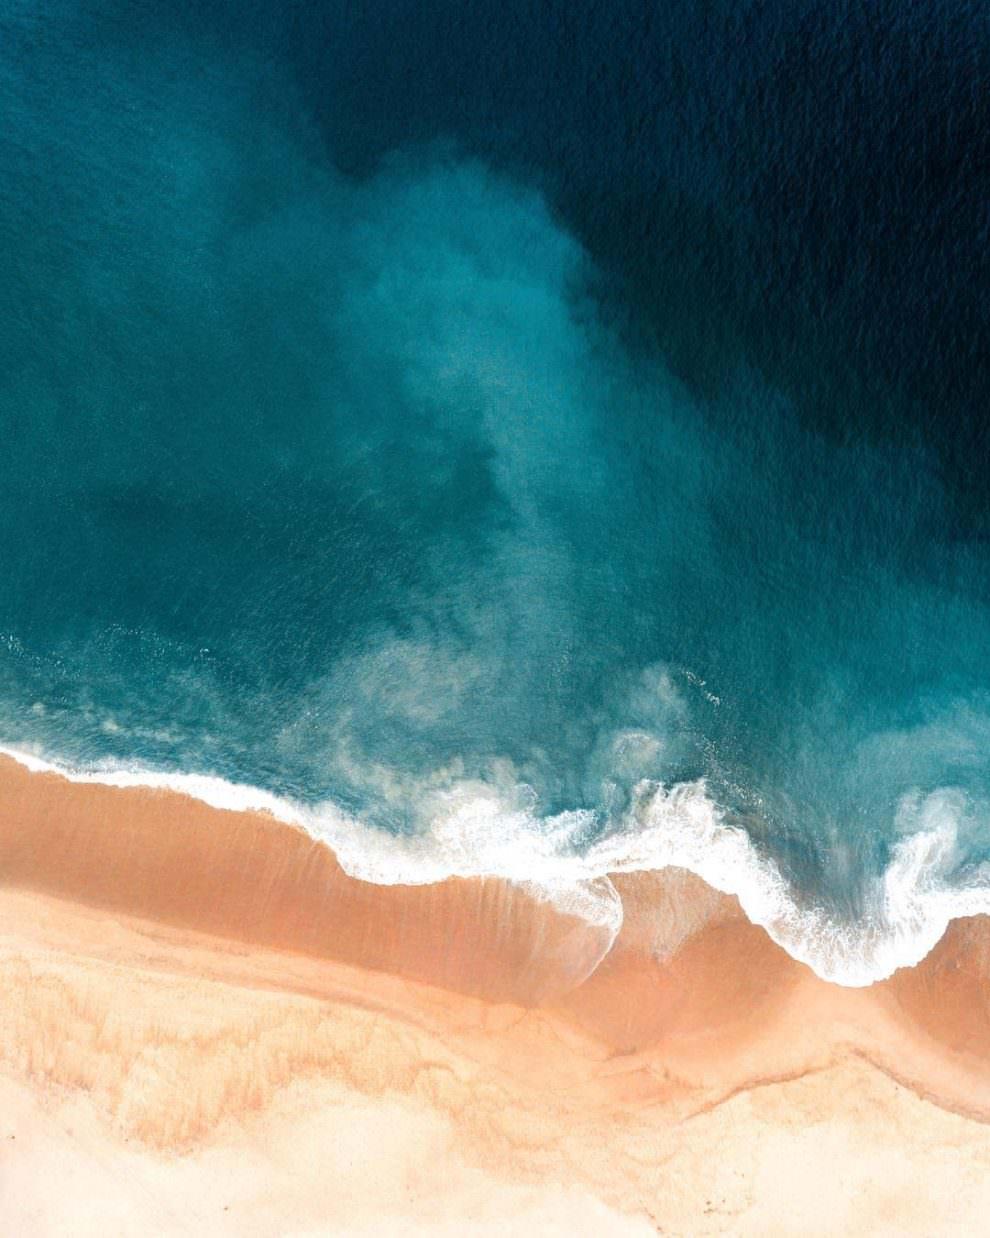 Amazing Drone Pictures Of Laguna Beach